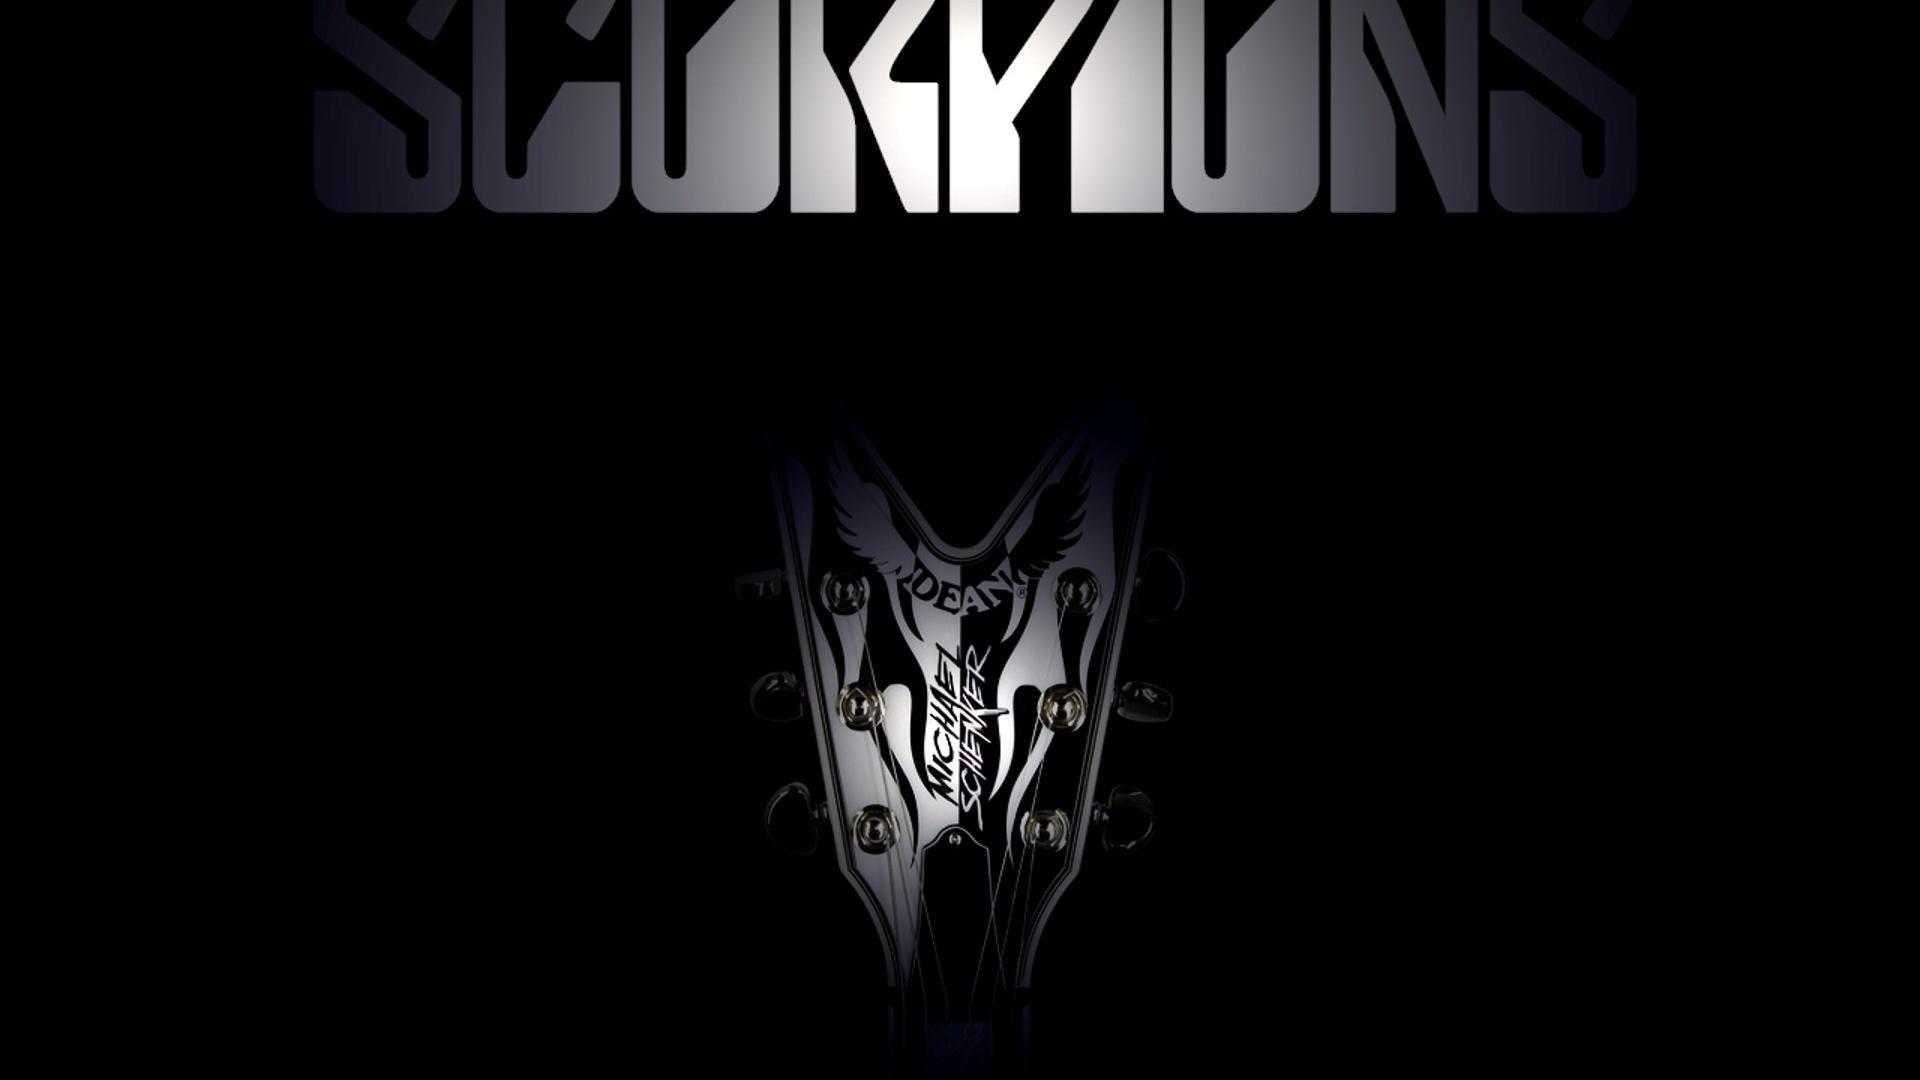 Scorpions 4K Scorpions Computer Wallpaper Scorpions Deskto …